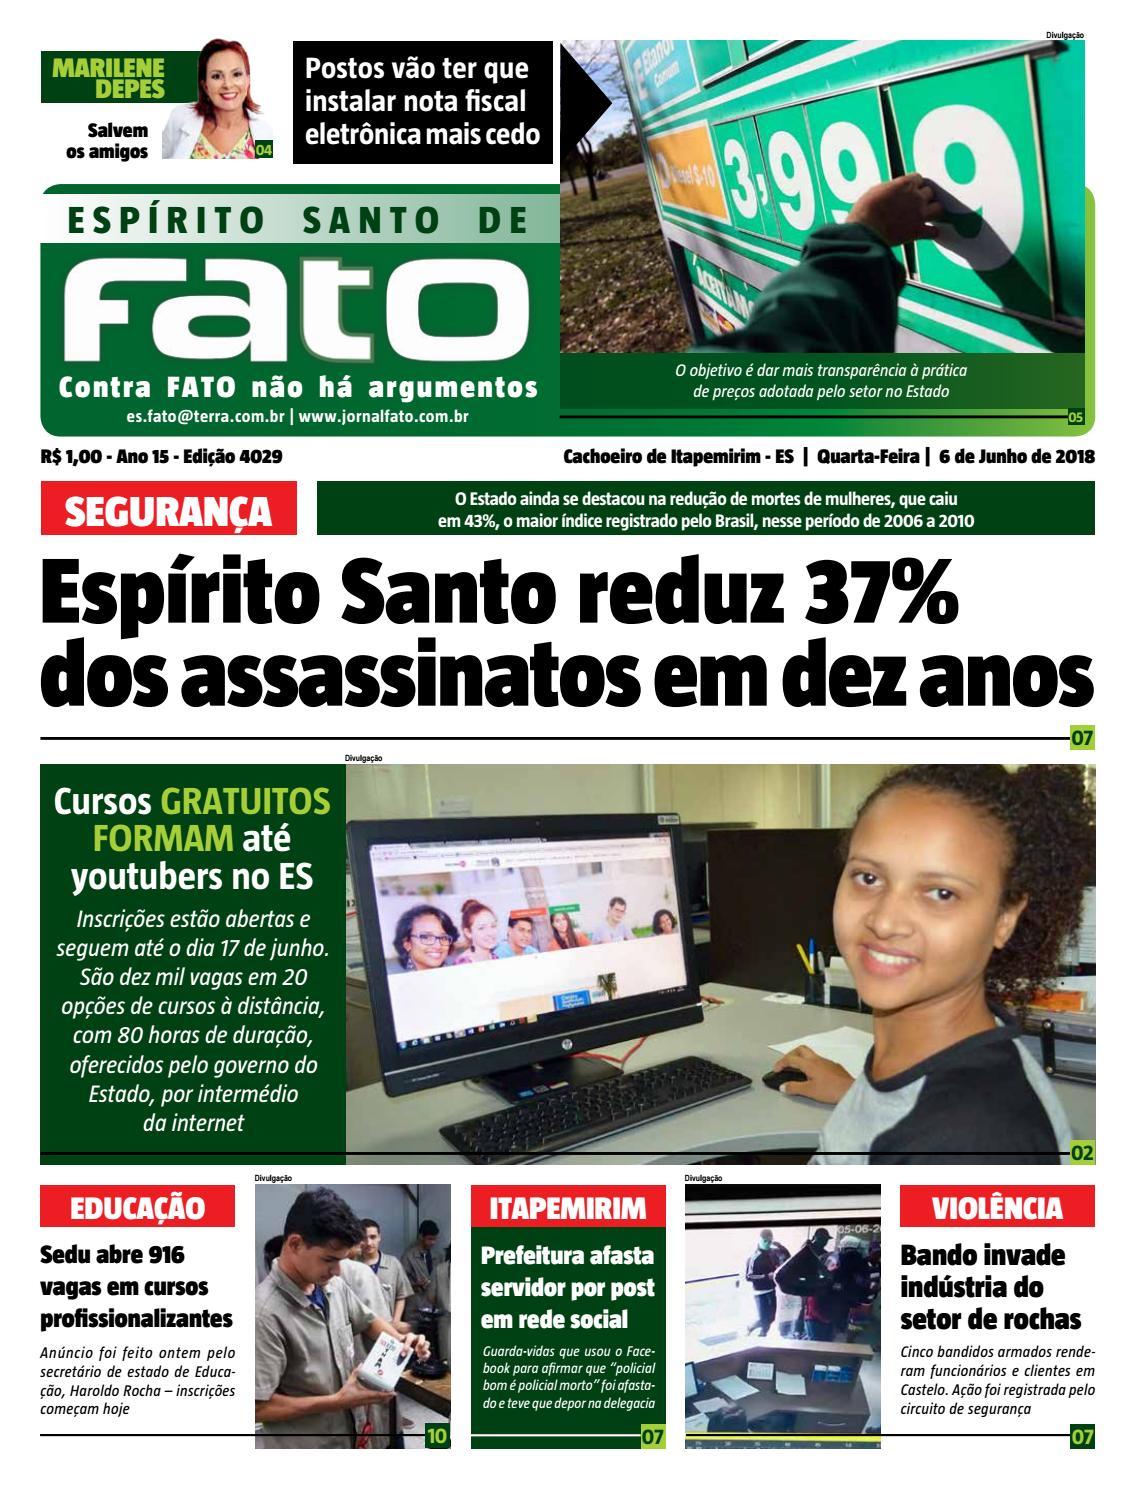 063a708ca42 Jornal fato 0606 18 by Jornal Fato - issuu